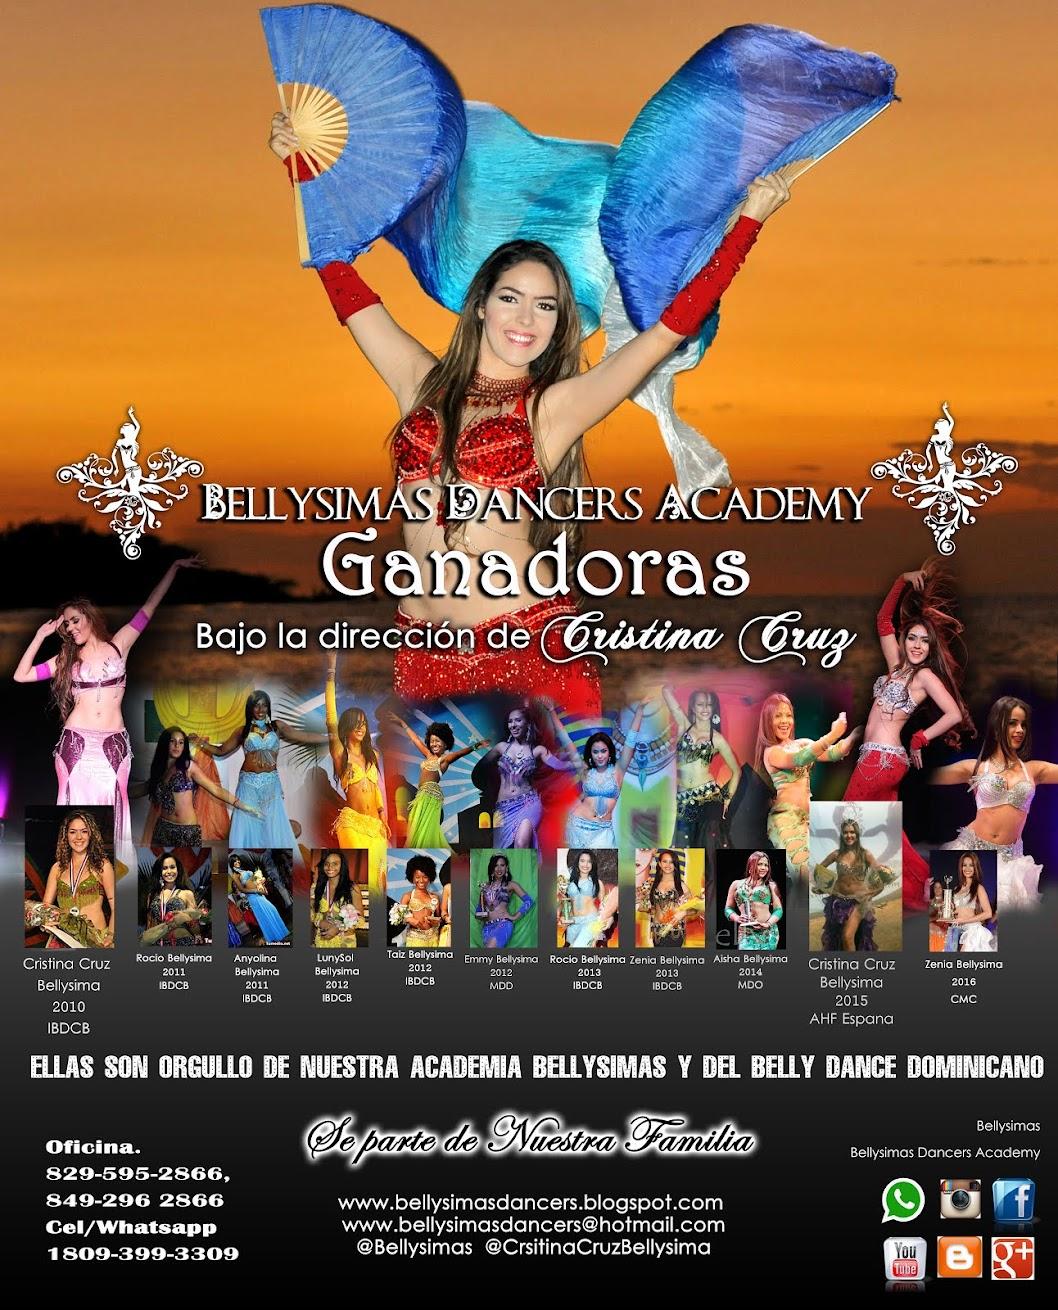 Orgullos de Bellysimas Dancers Academy